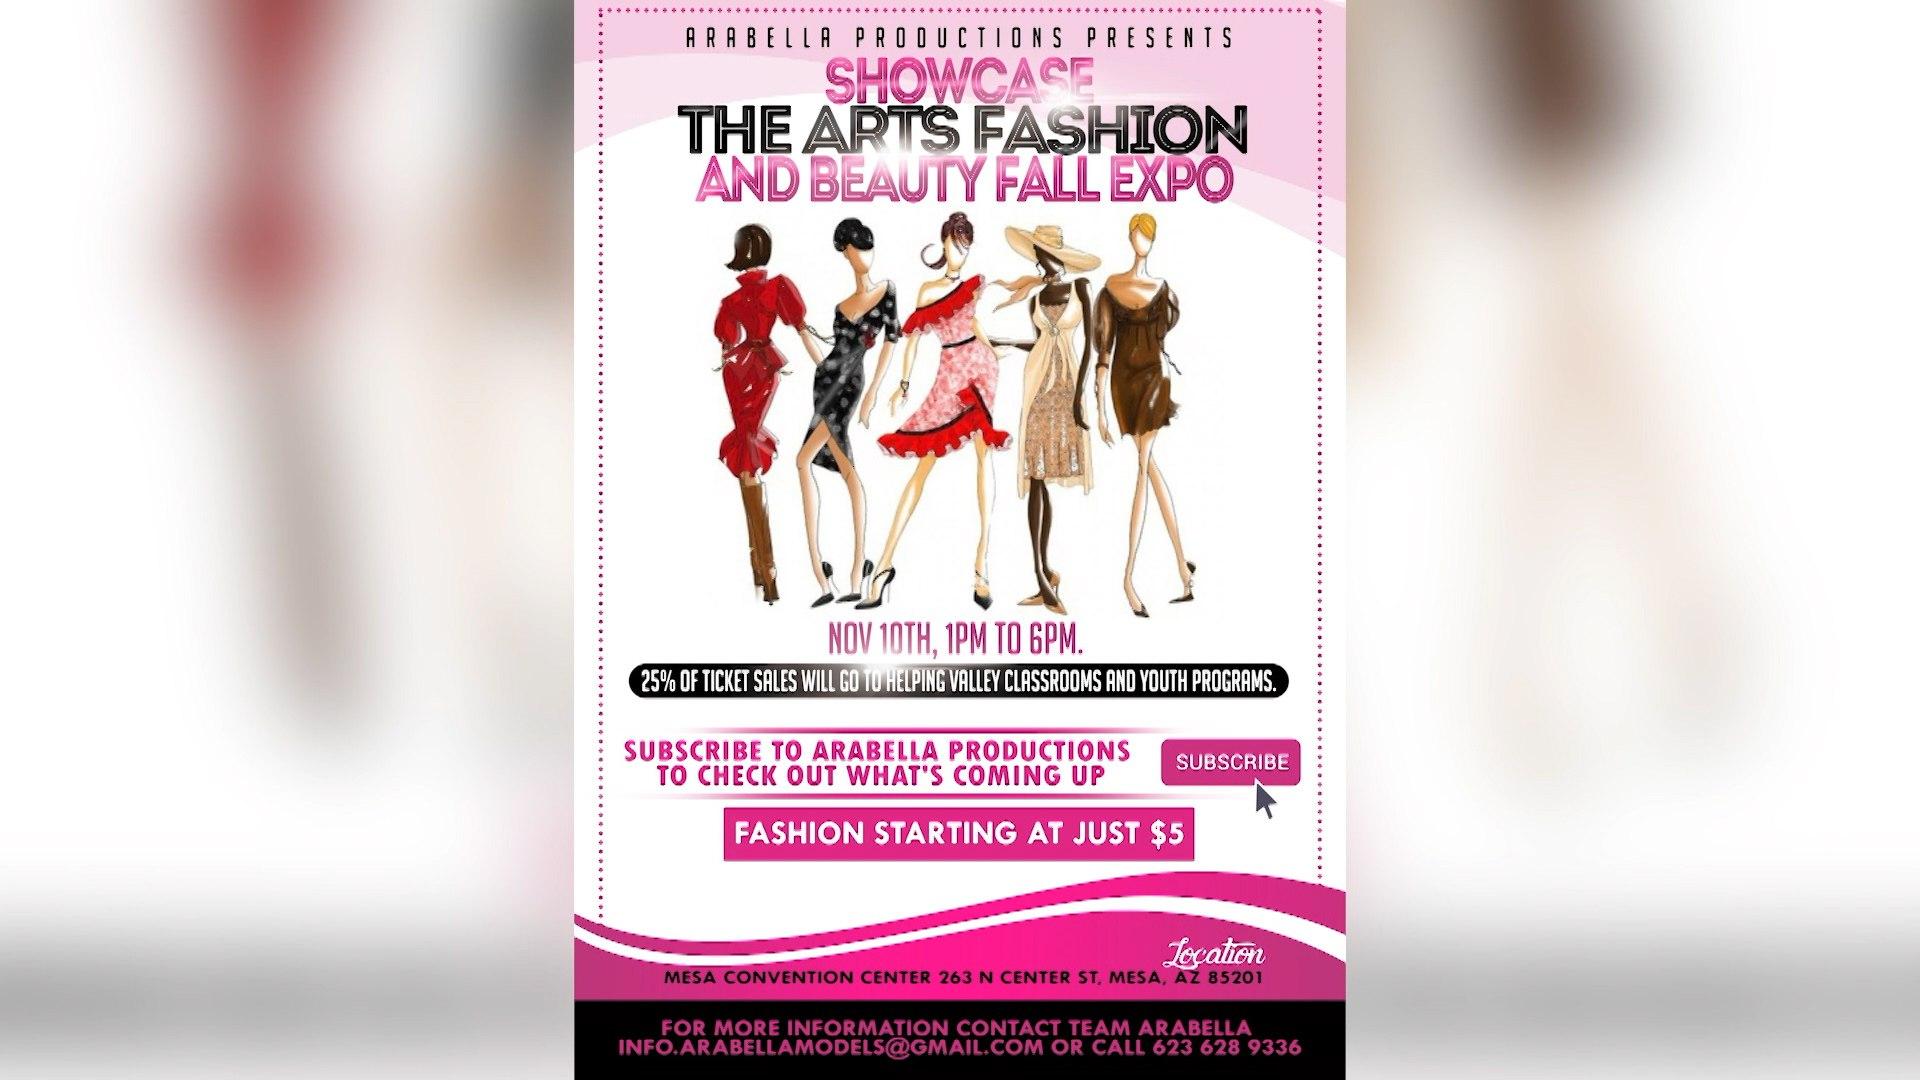 Showcase the Arts Fashion and Beauty Expo